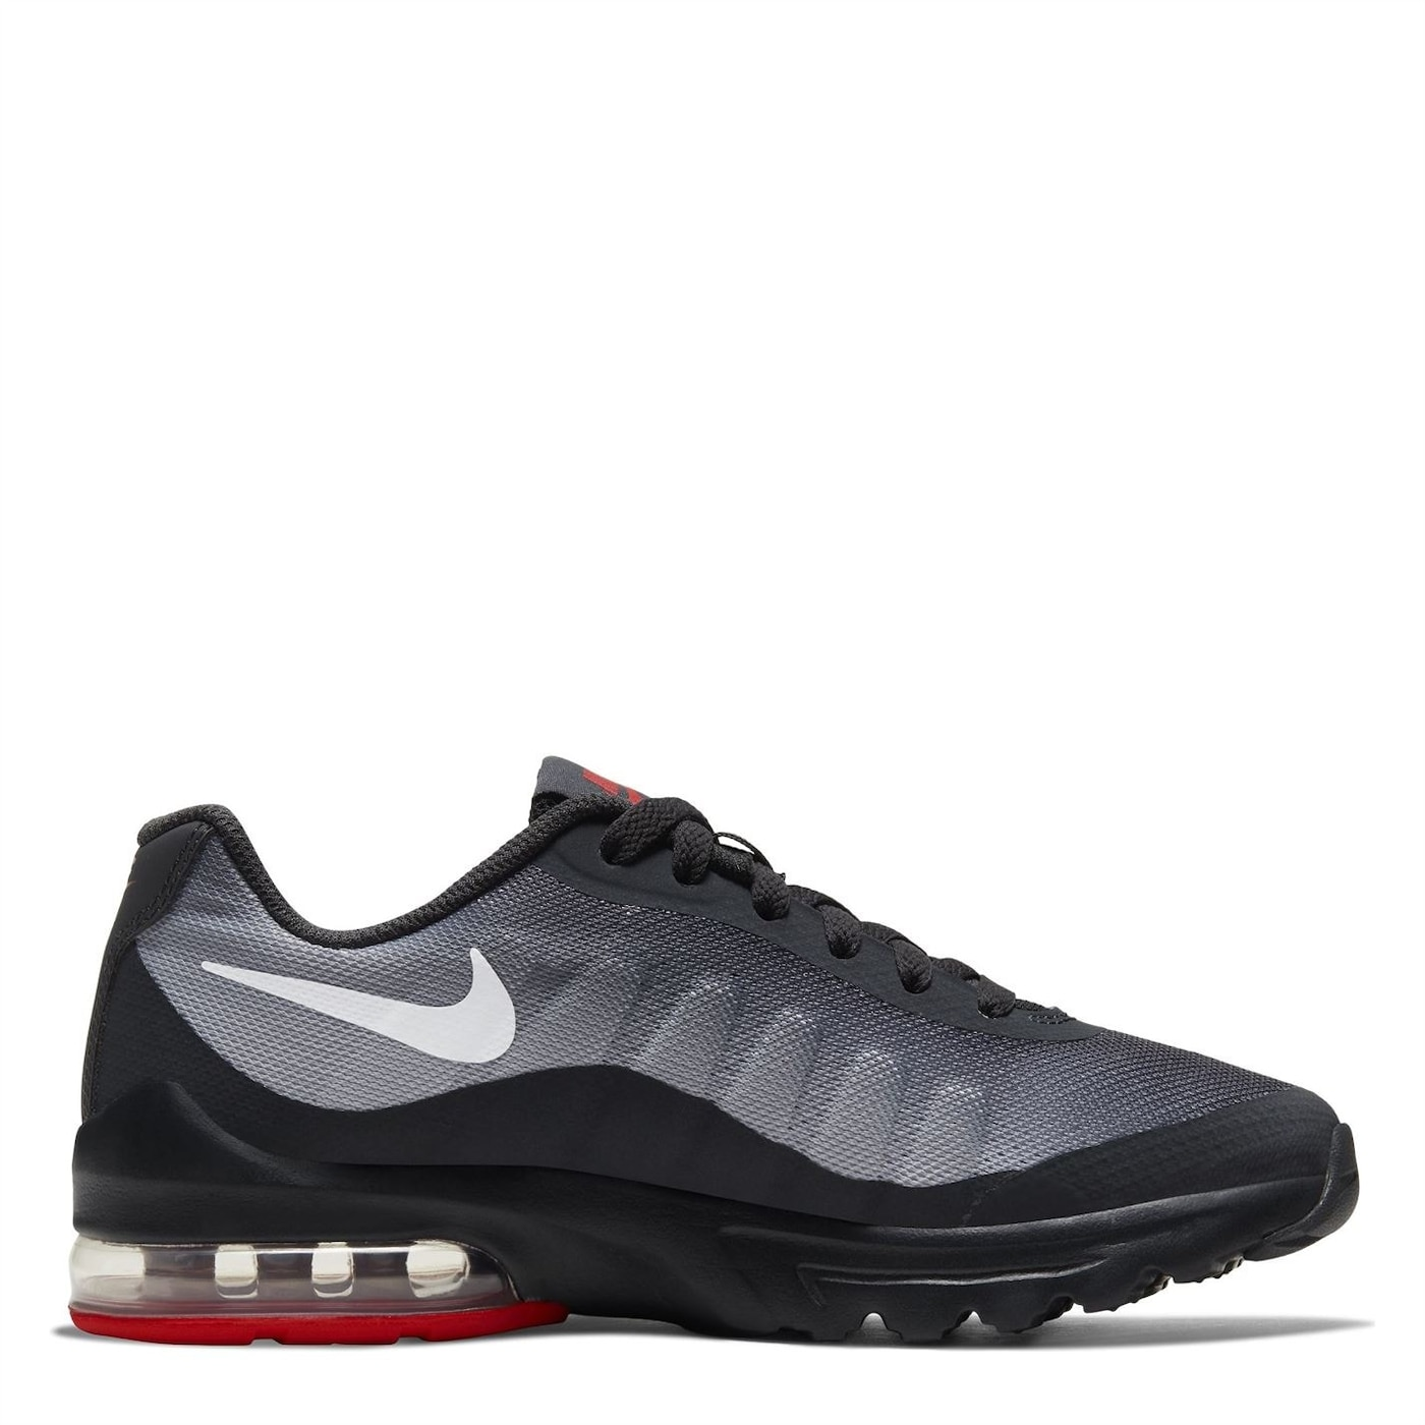 Nike Air Max Invigor Print Big Kids' Shoe